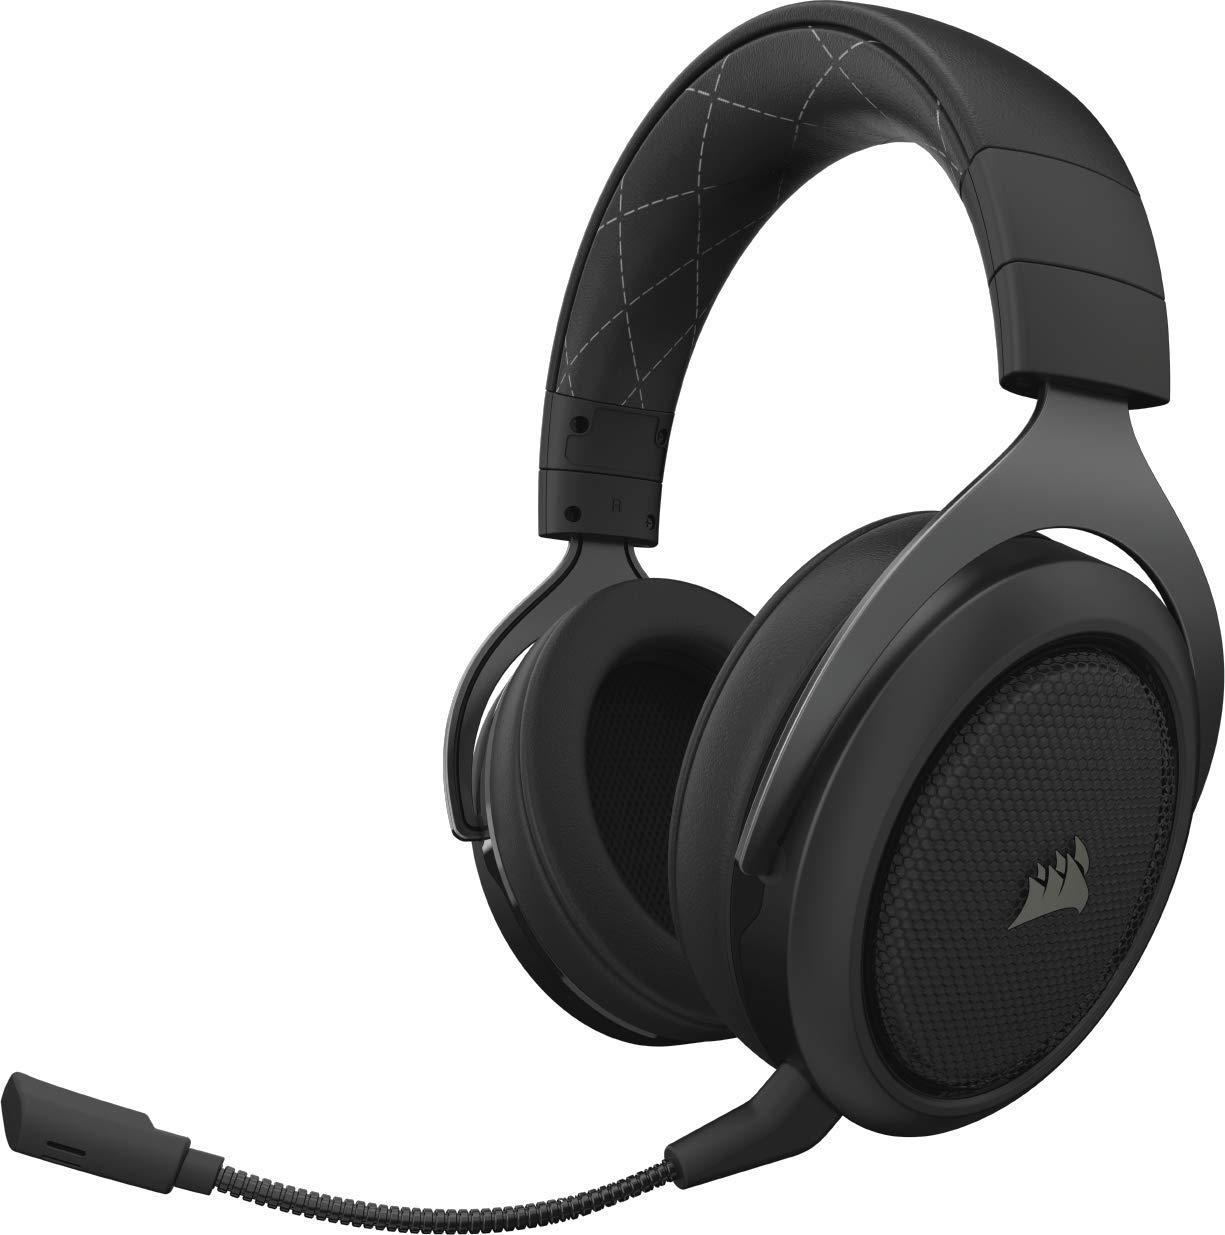 Auriculares Corsair HS70 Wireless Negro (en Game y en Amazon)